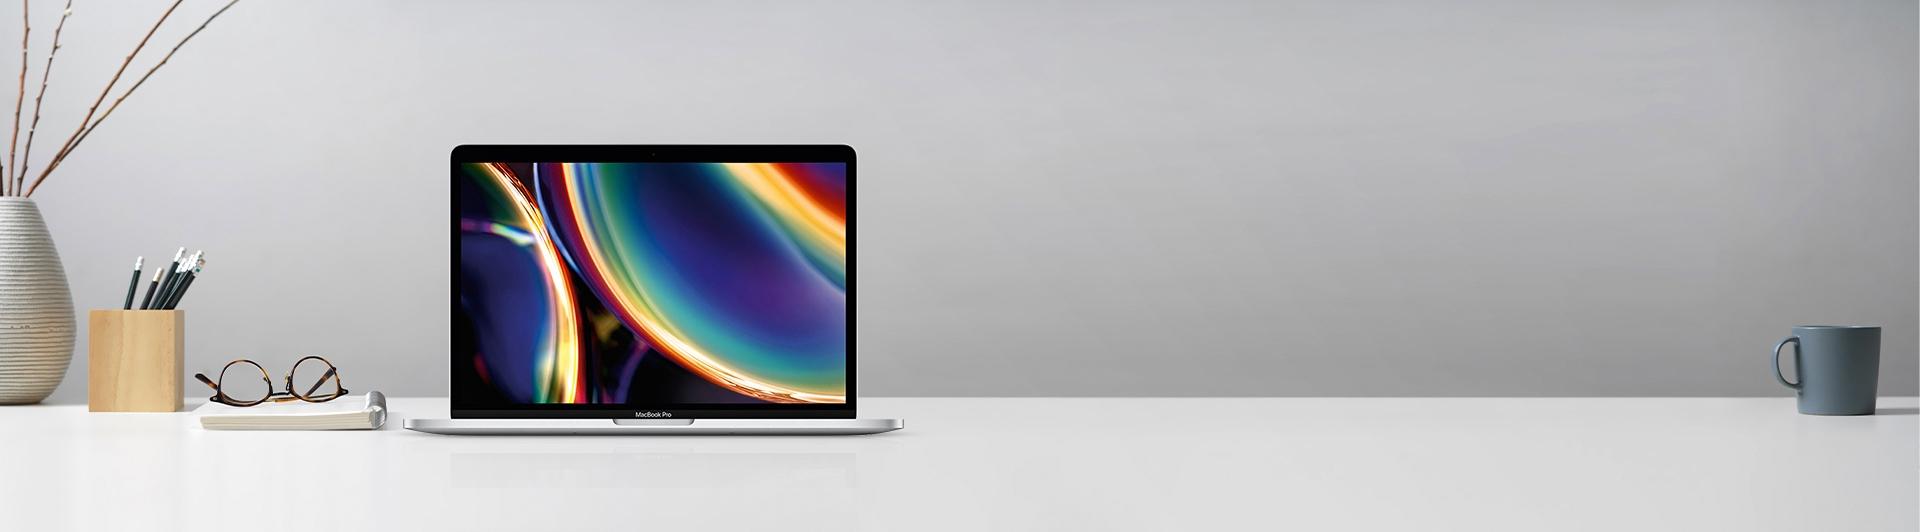 Apple Macbook Pro i9 16 inch MVVM2SA/A 2019